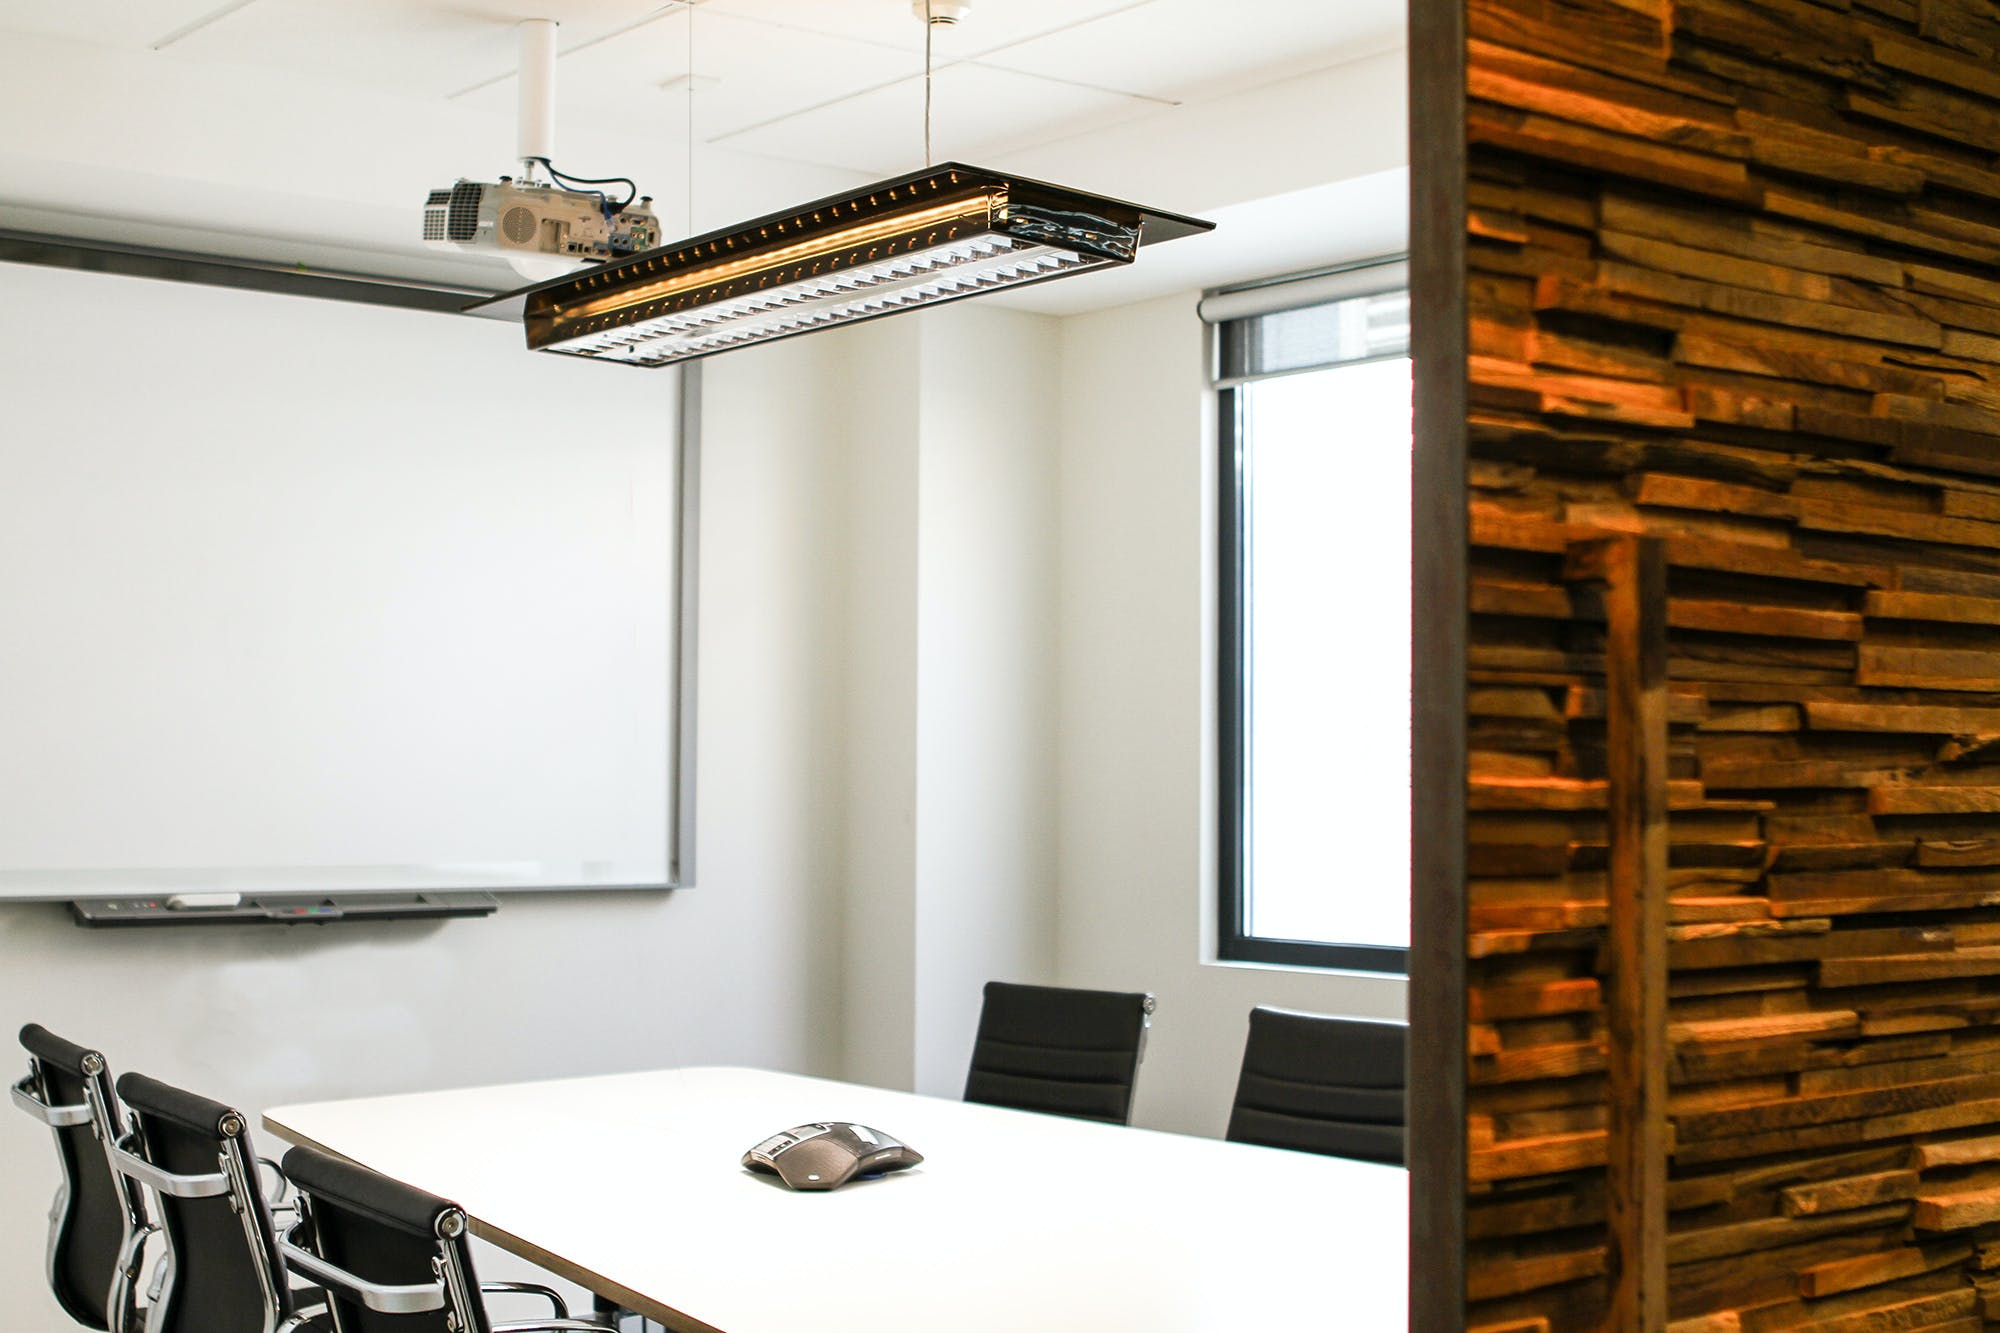 Hot desk at Officenexus, image 10